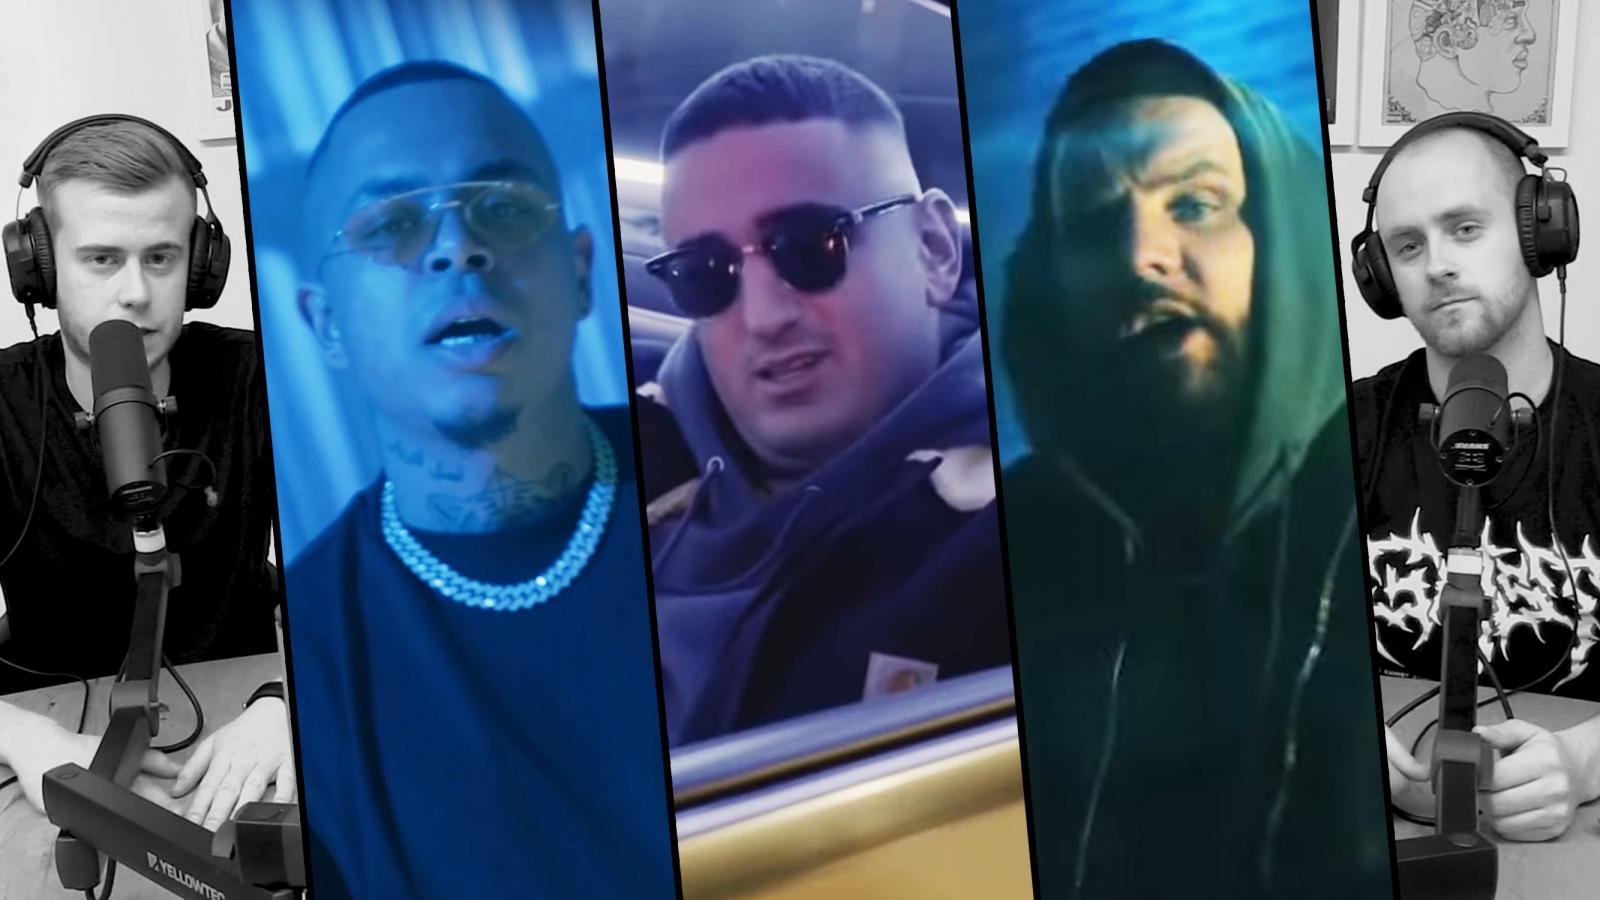 Luciano, Maaf, Haftbefehl, Milonair, Fler, Joker Bra, Mozzik & mehr – Release Friday